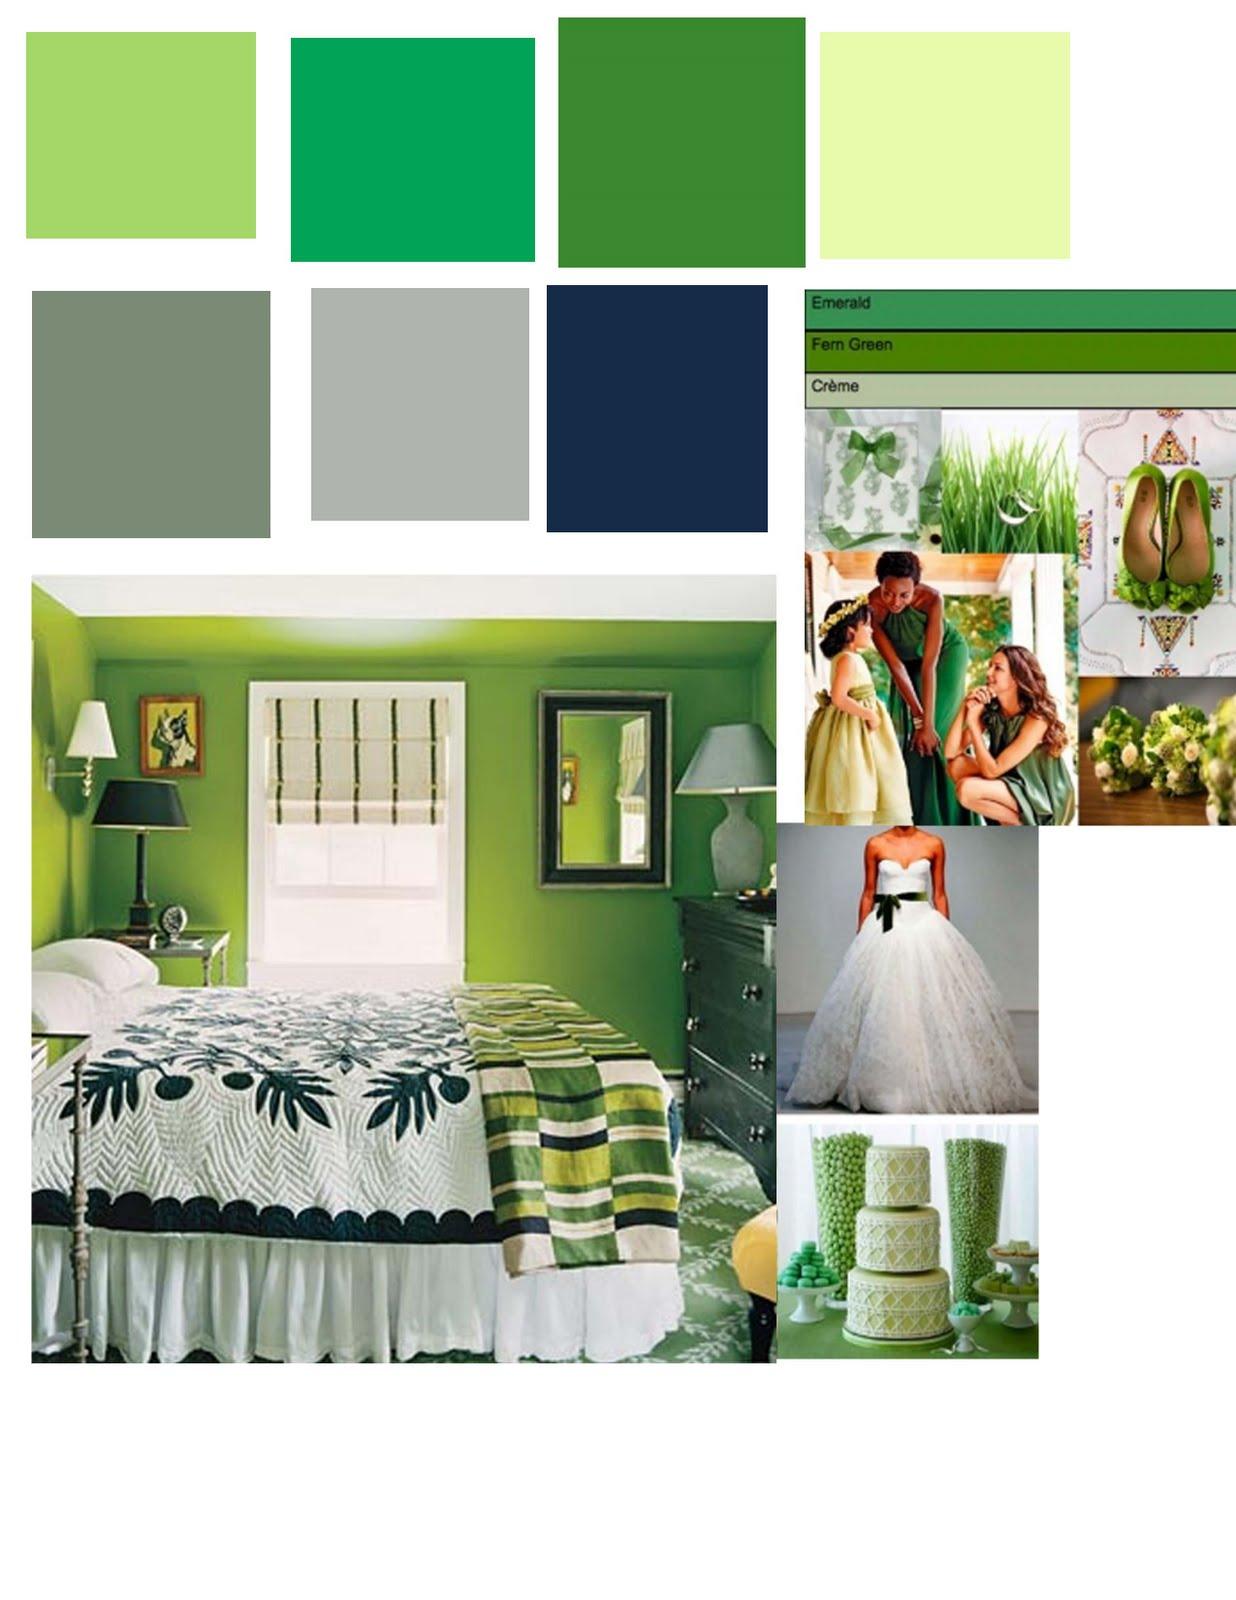 Calming wallpaper for bedrooms free download wallpaper - Green and grey bedroom ...